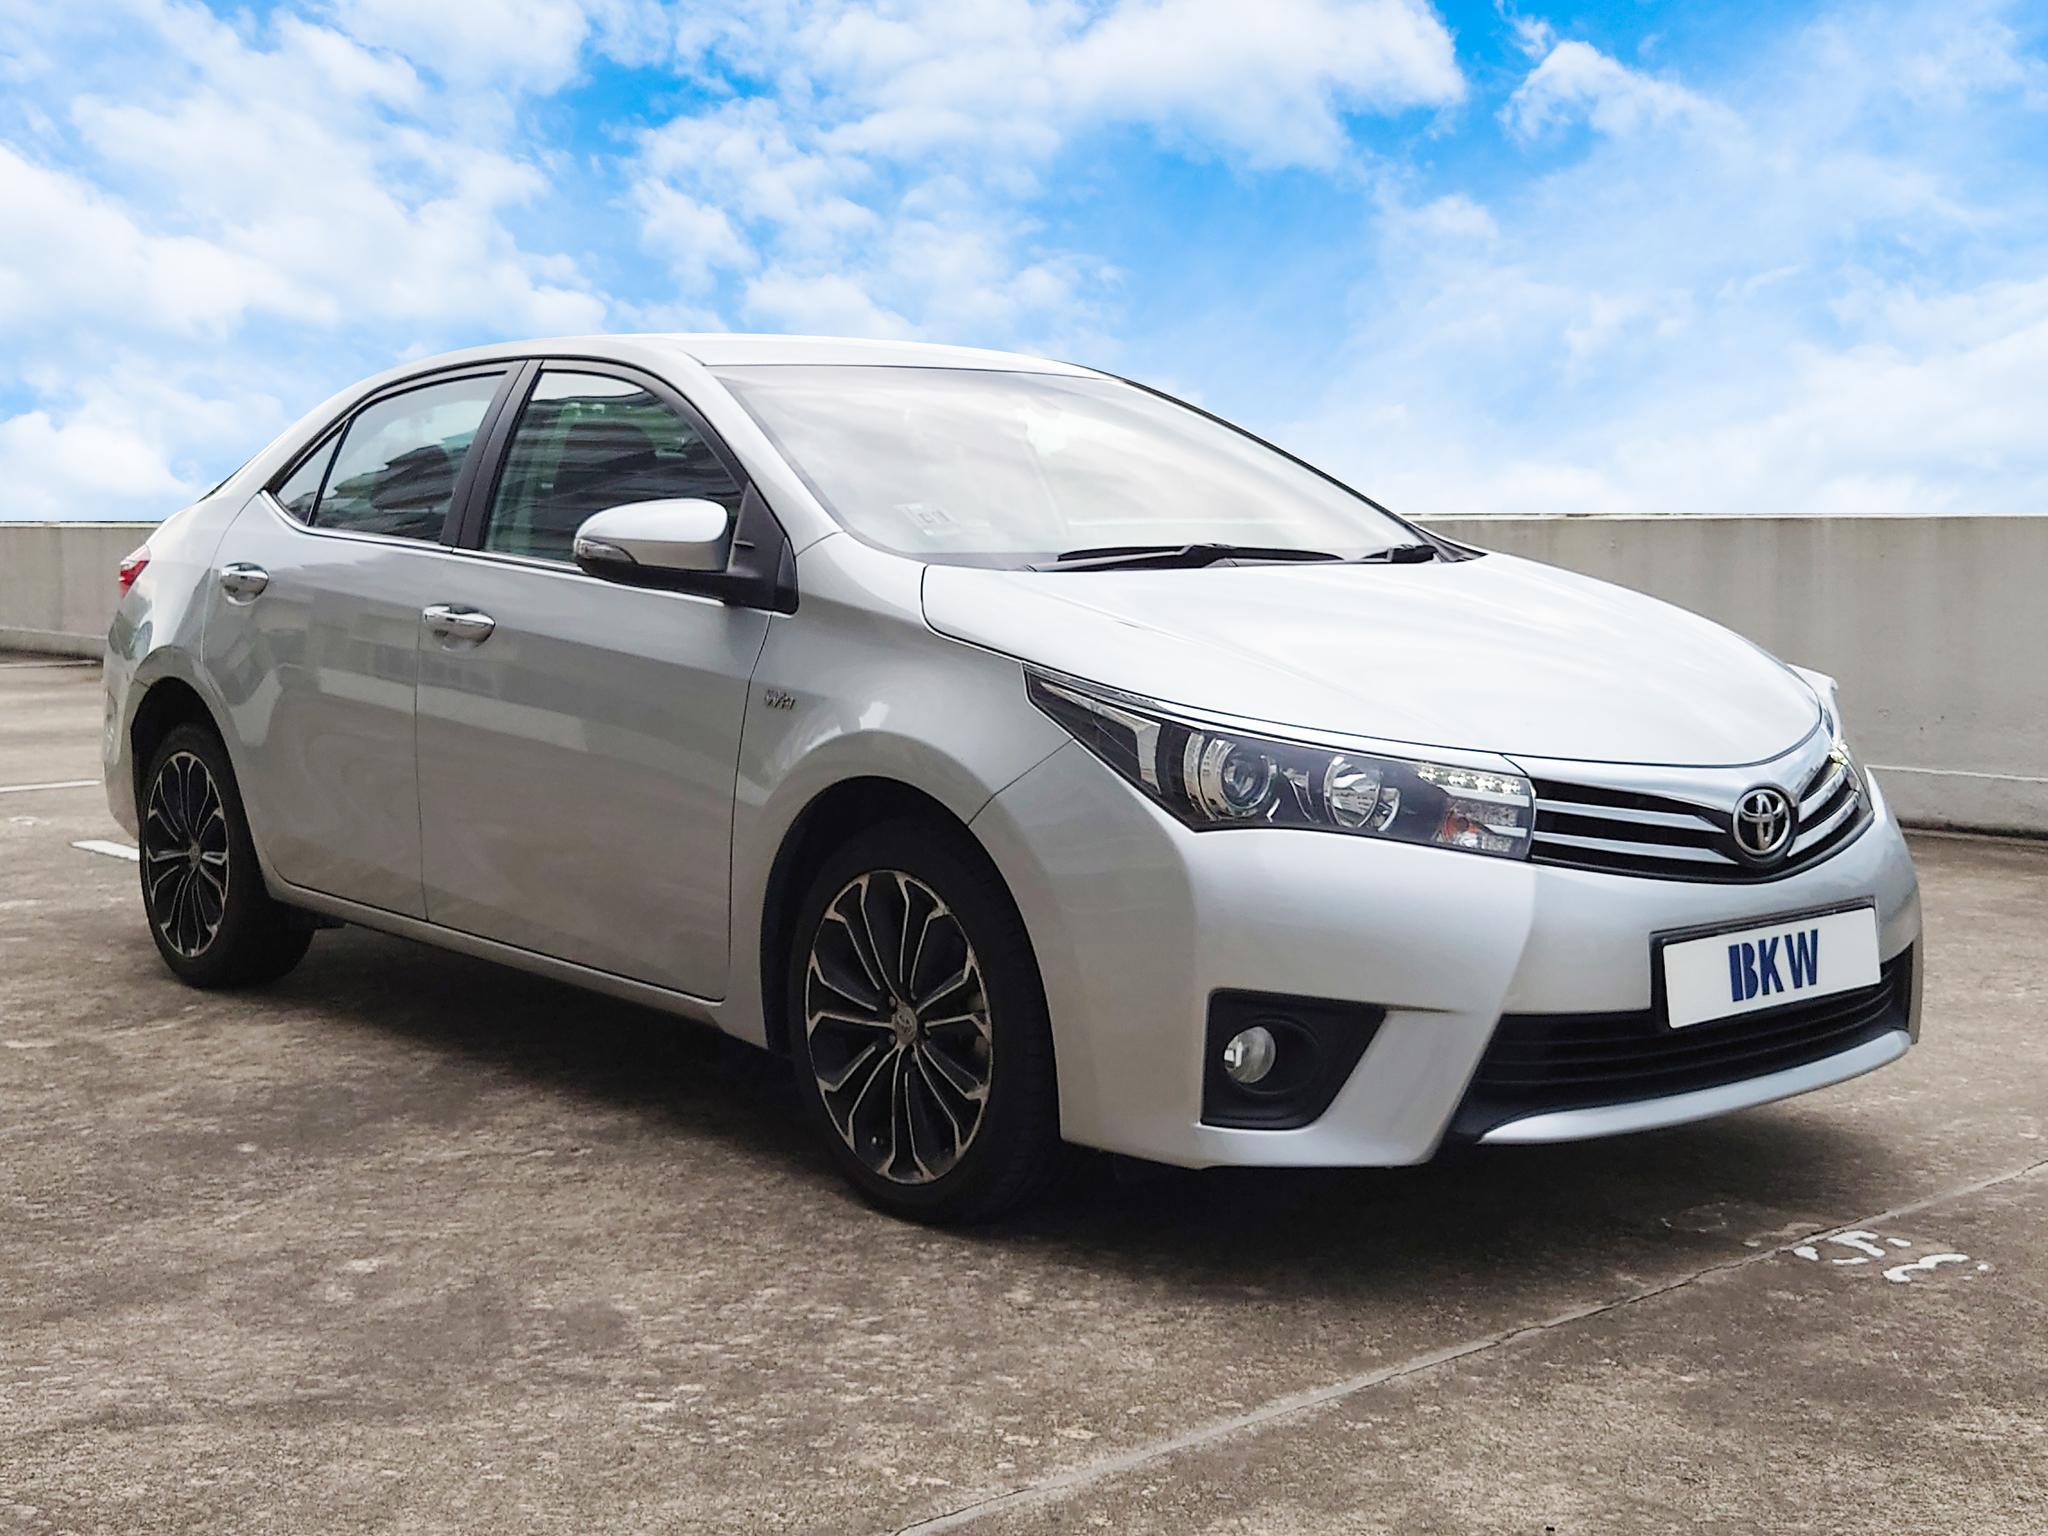 Toyota Altis 1.6A - BKW Rent A Car